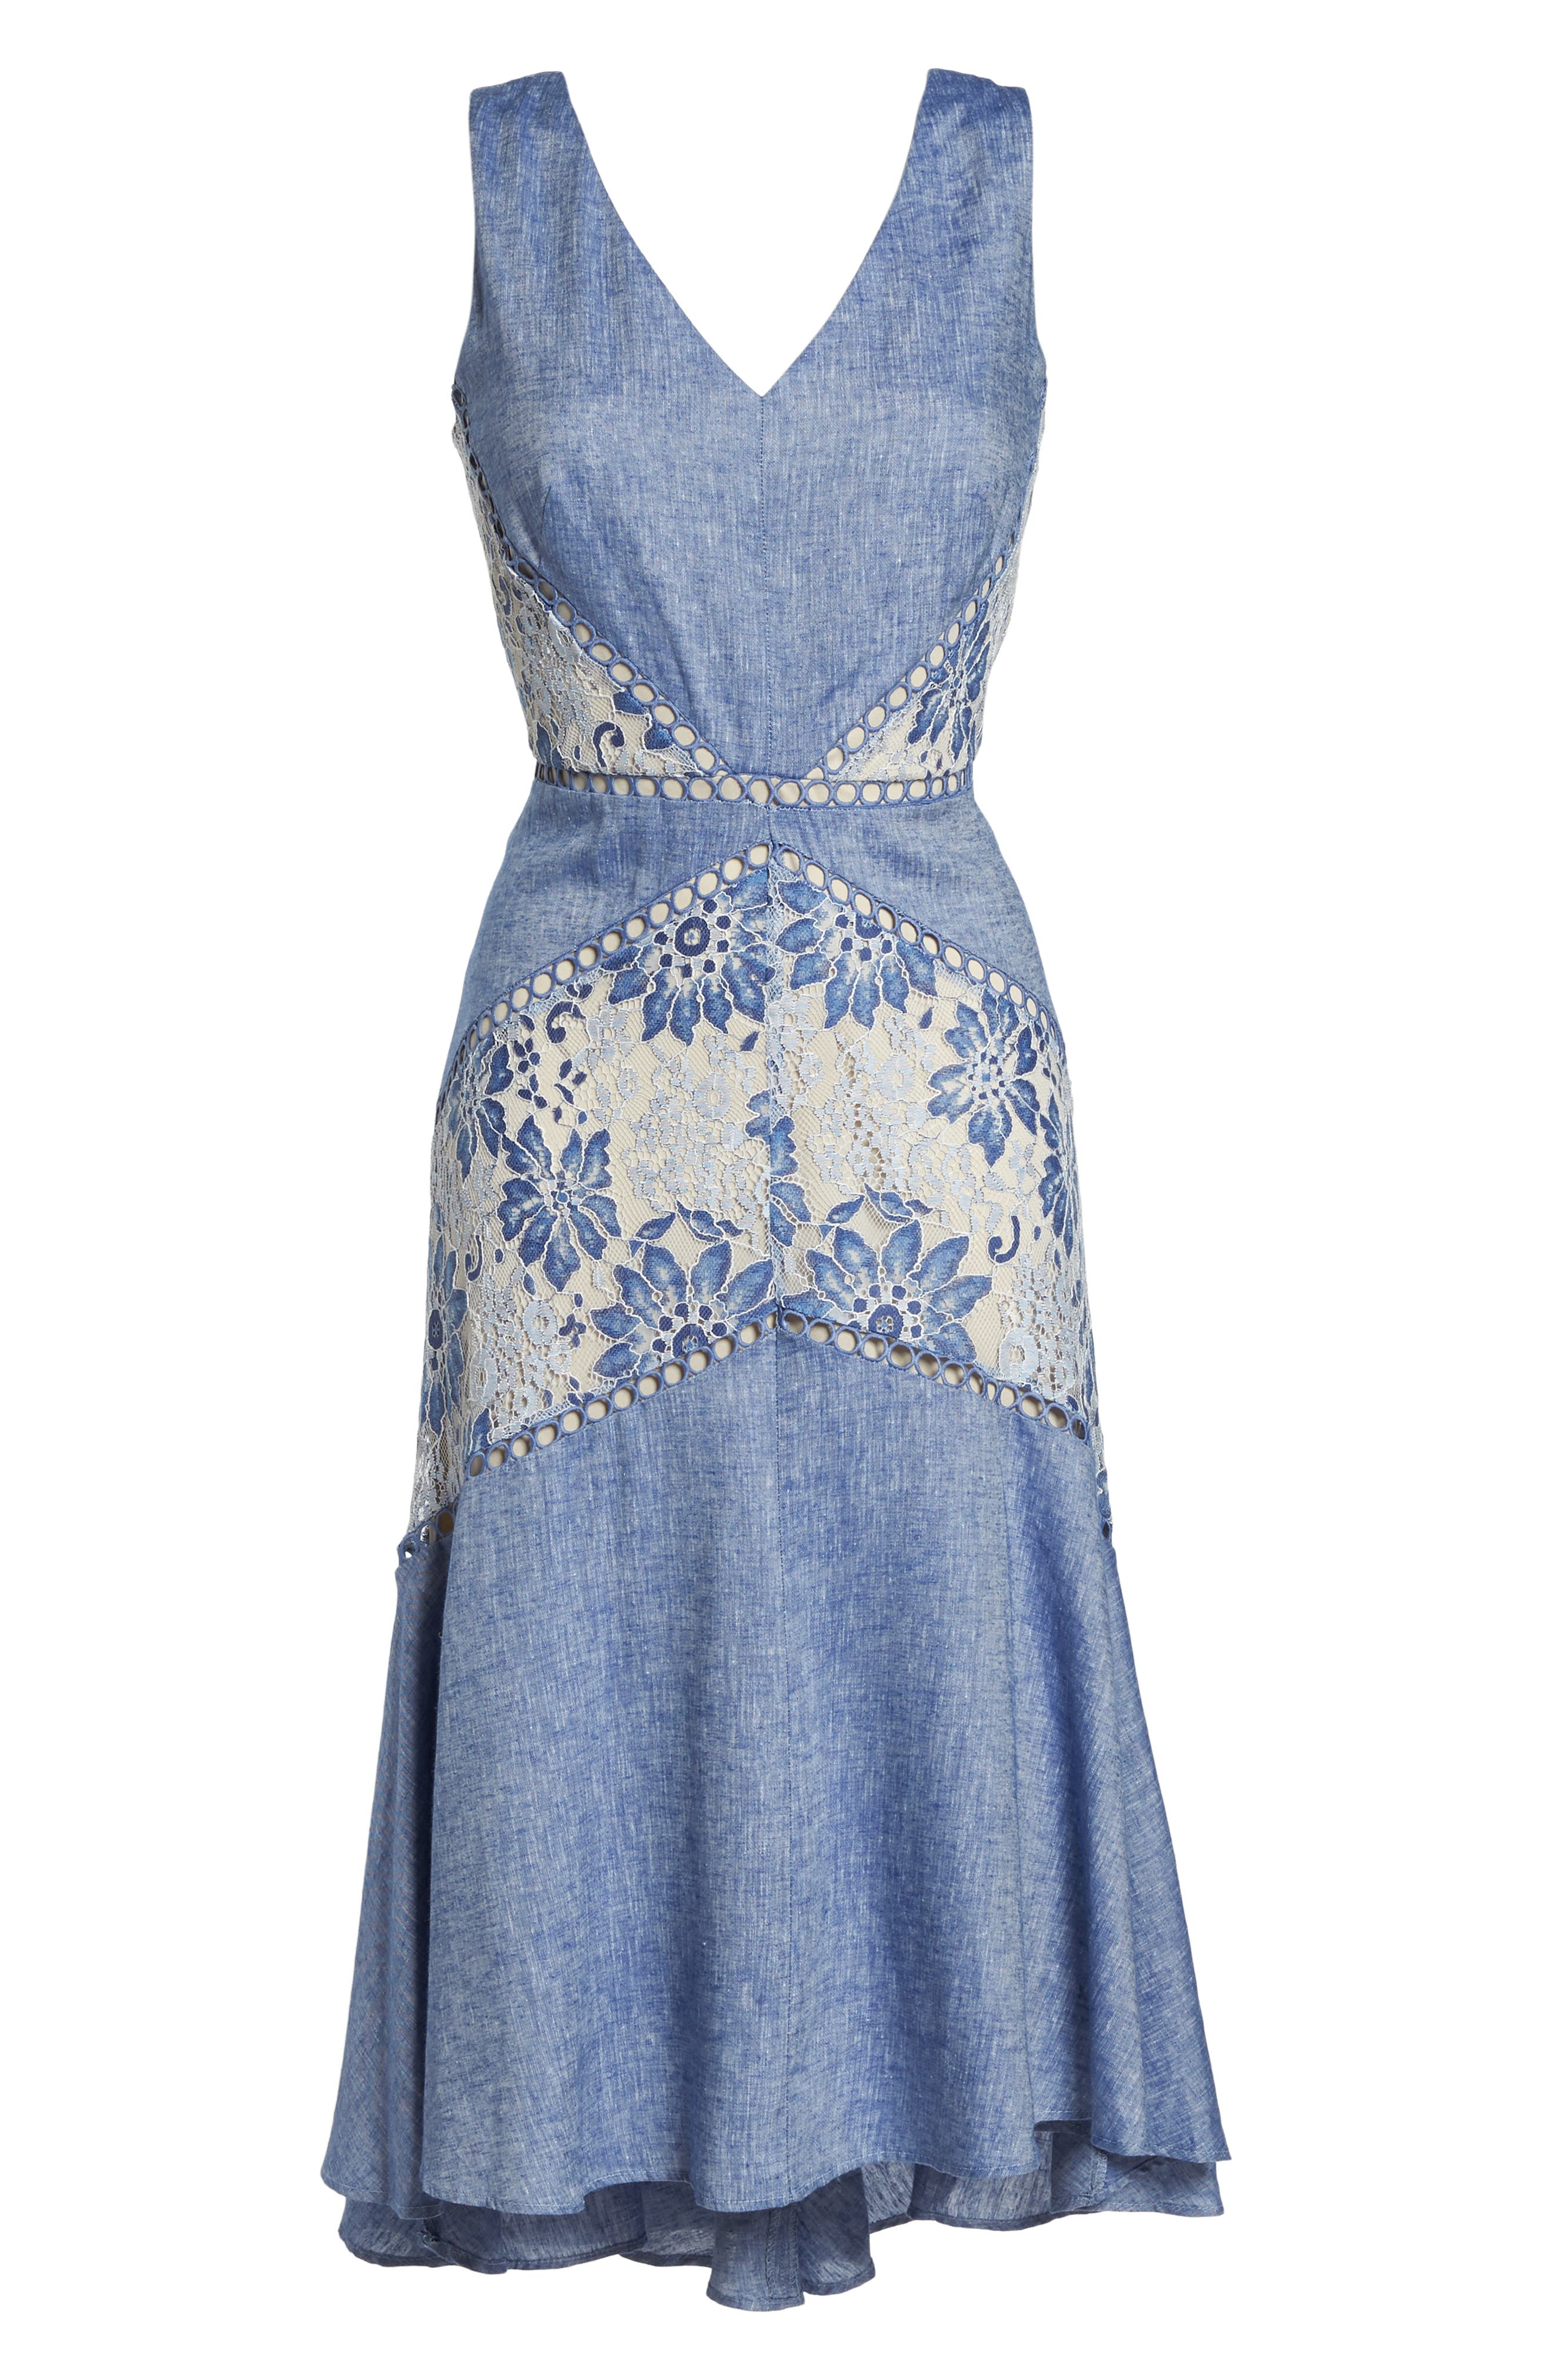 Chambray & Lace Midi Dress,                             Alternate thumbnail 7, color,                             Chambray Nude